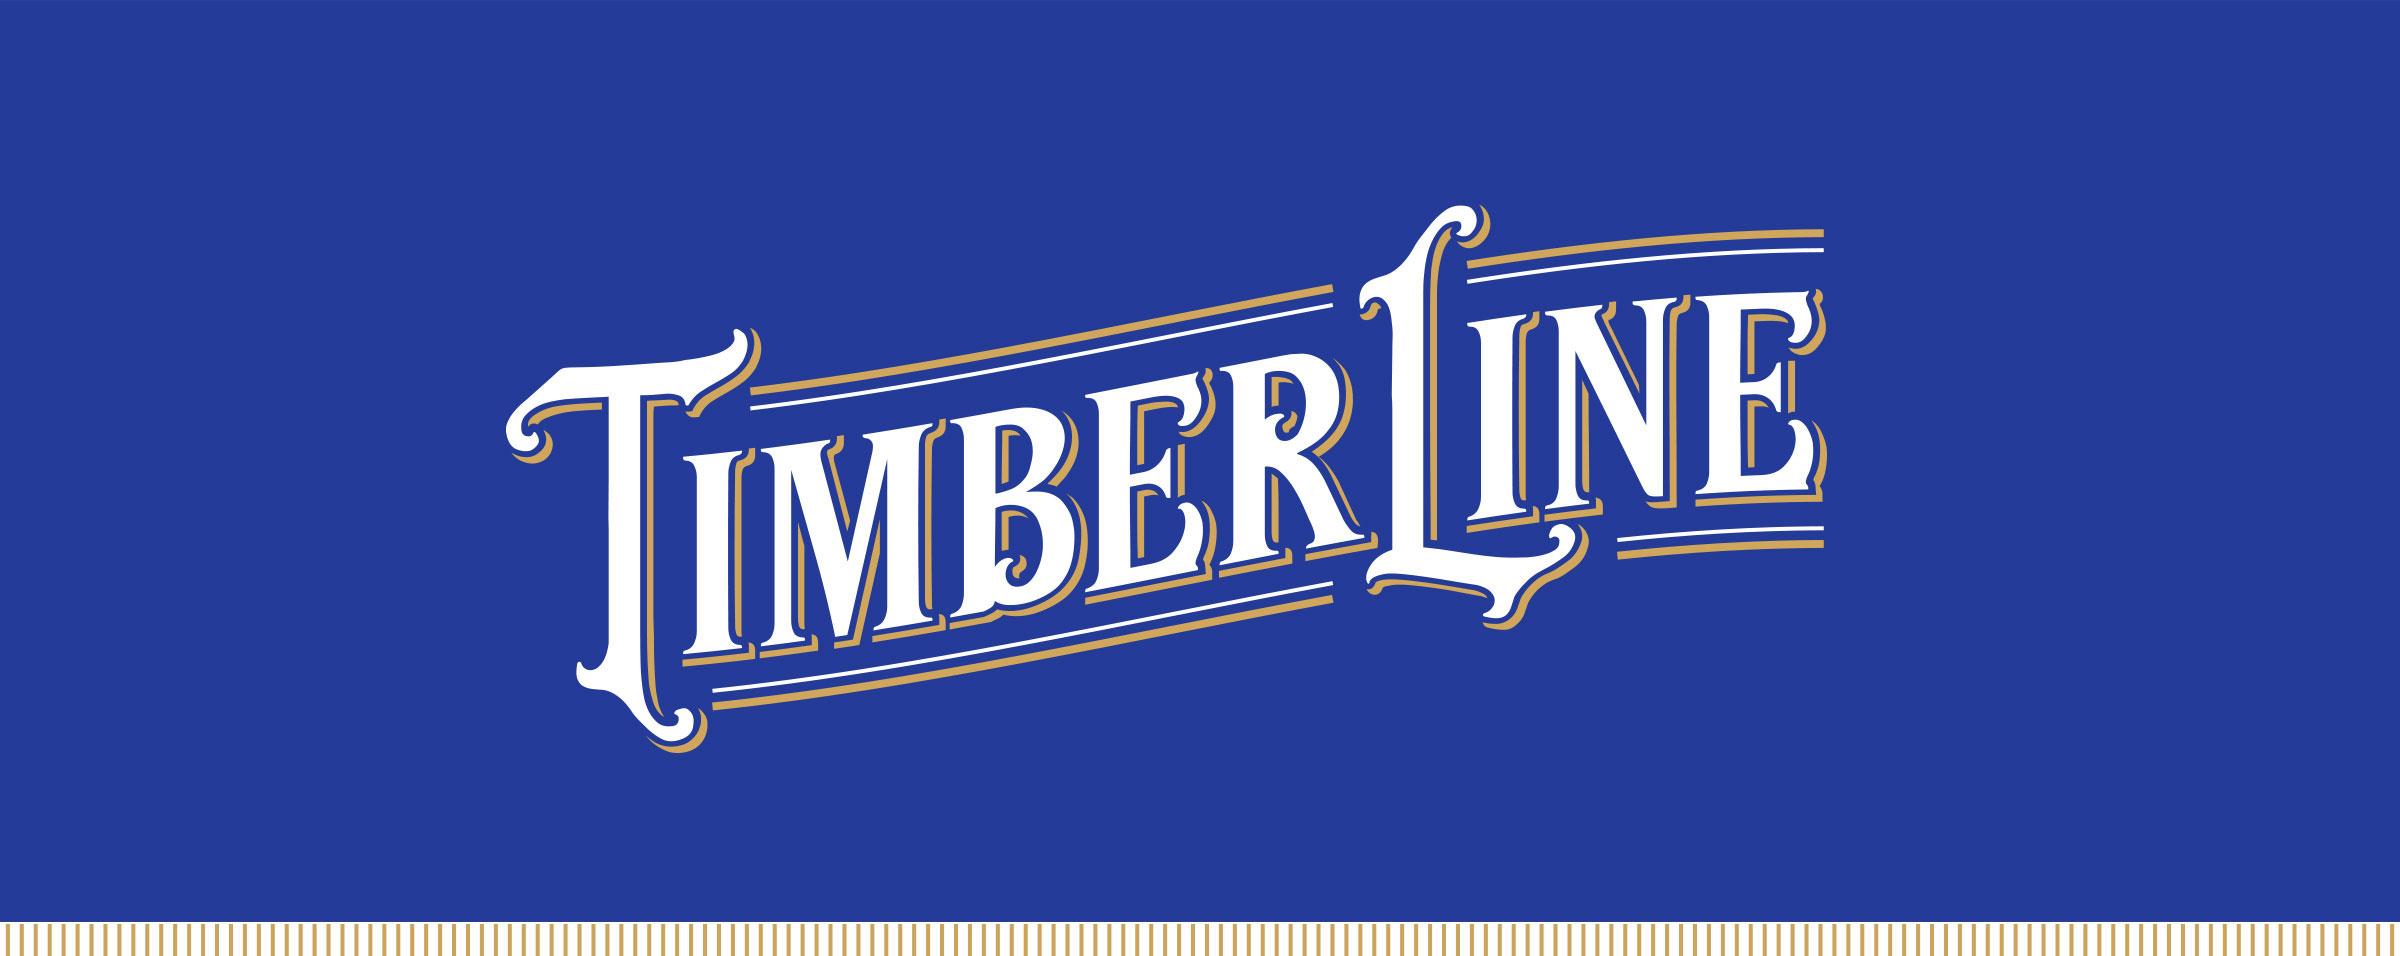 1-Timberline.jpg